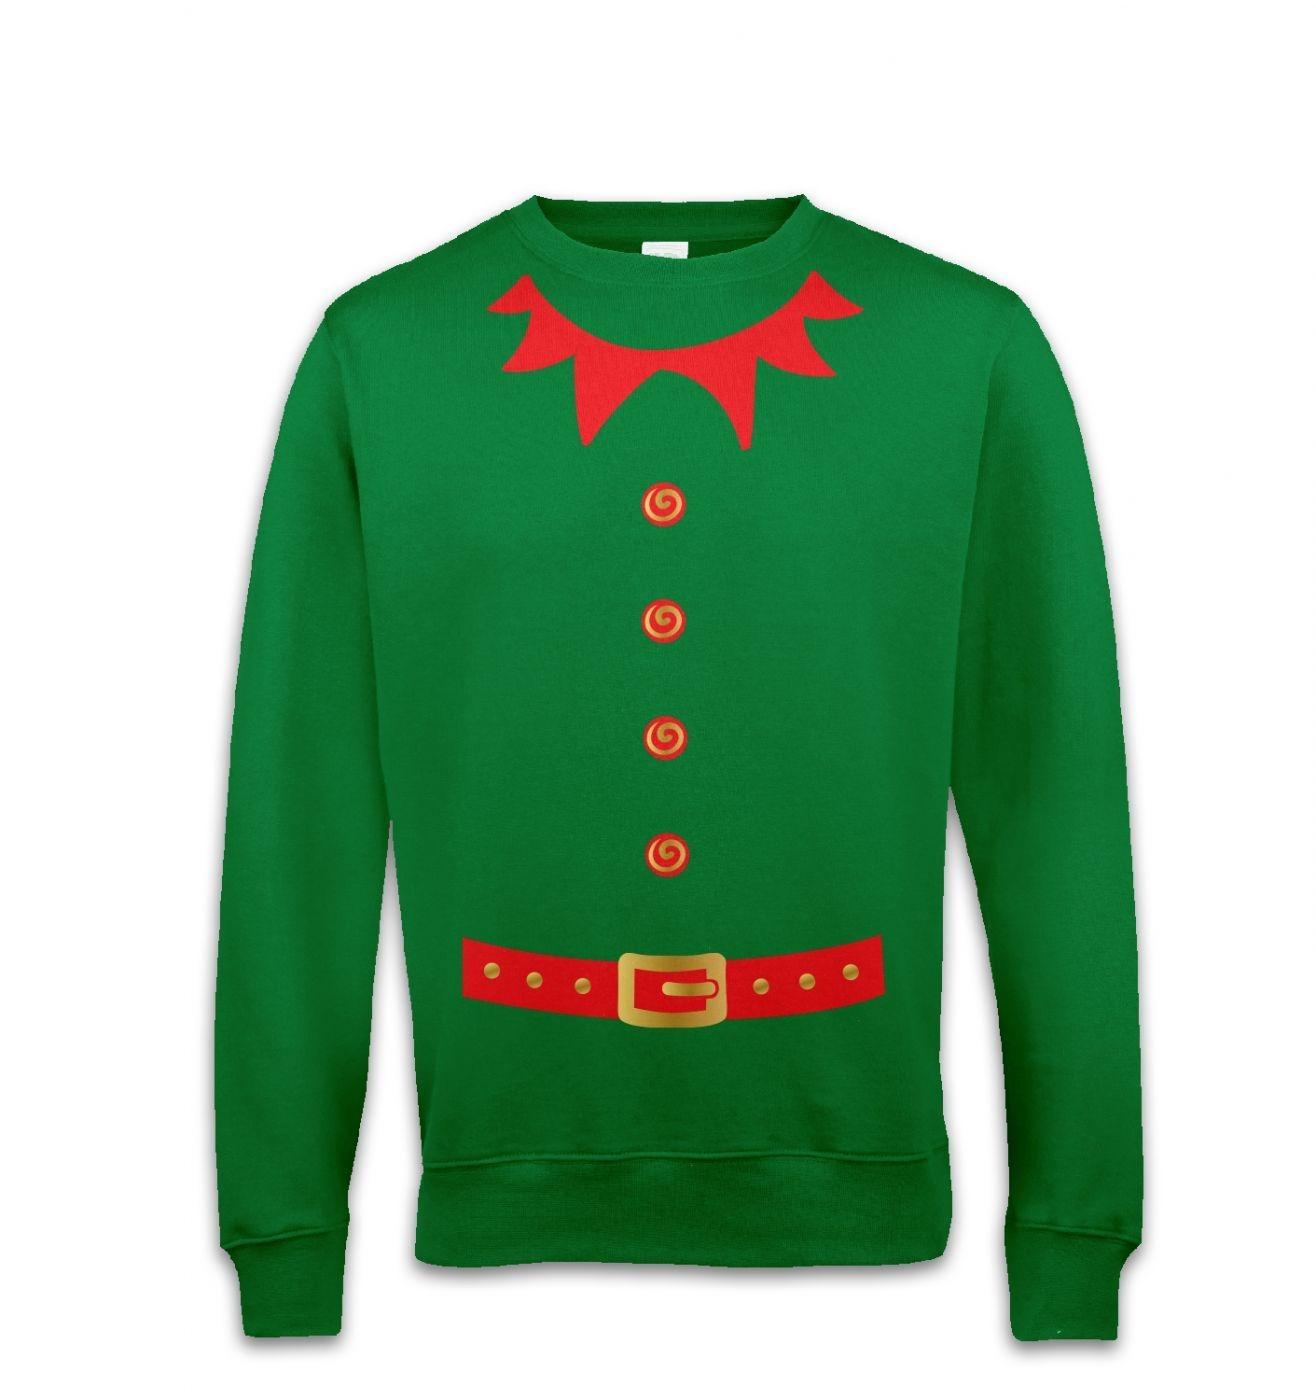 Elf costume (red detail)  sweatshirt